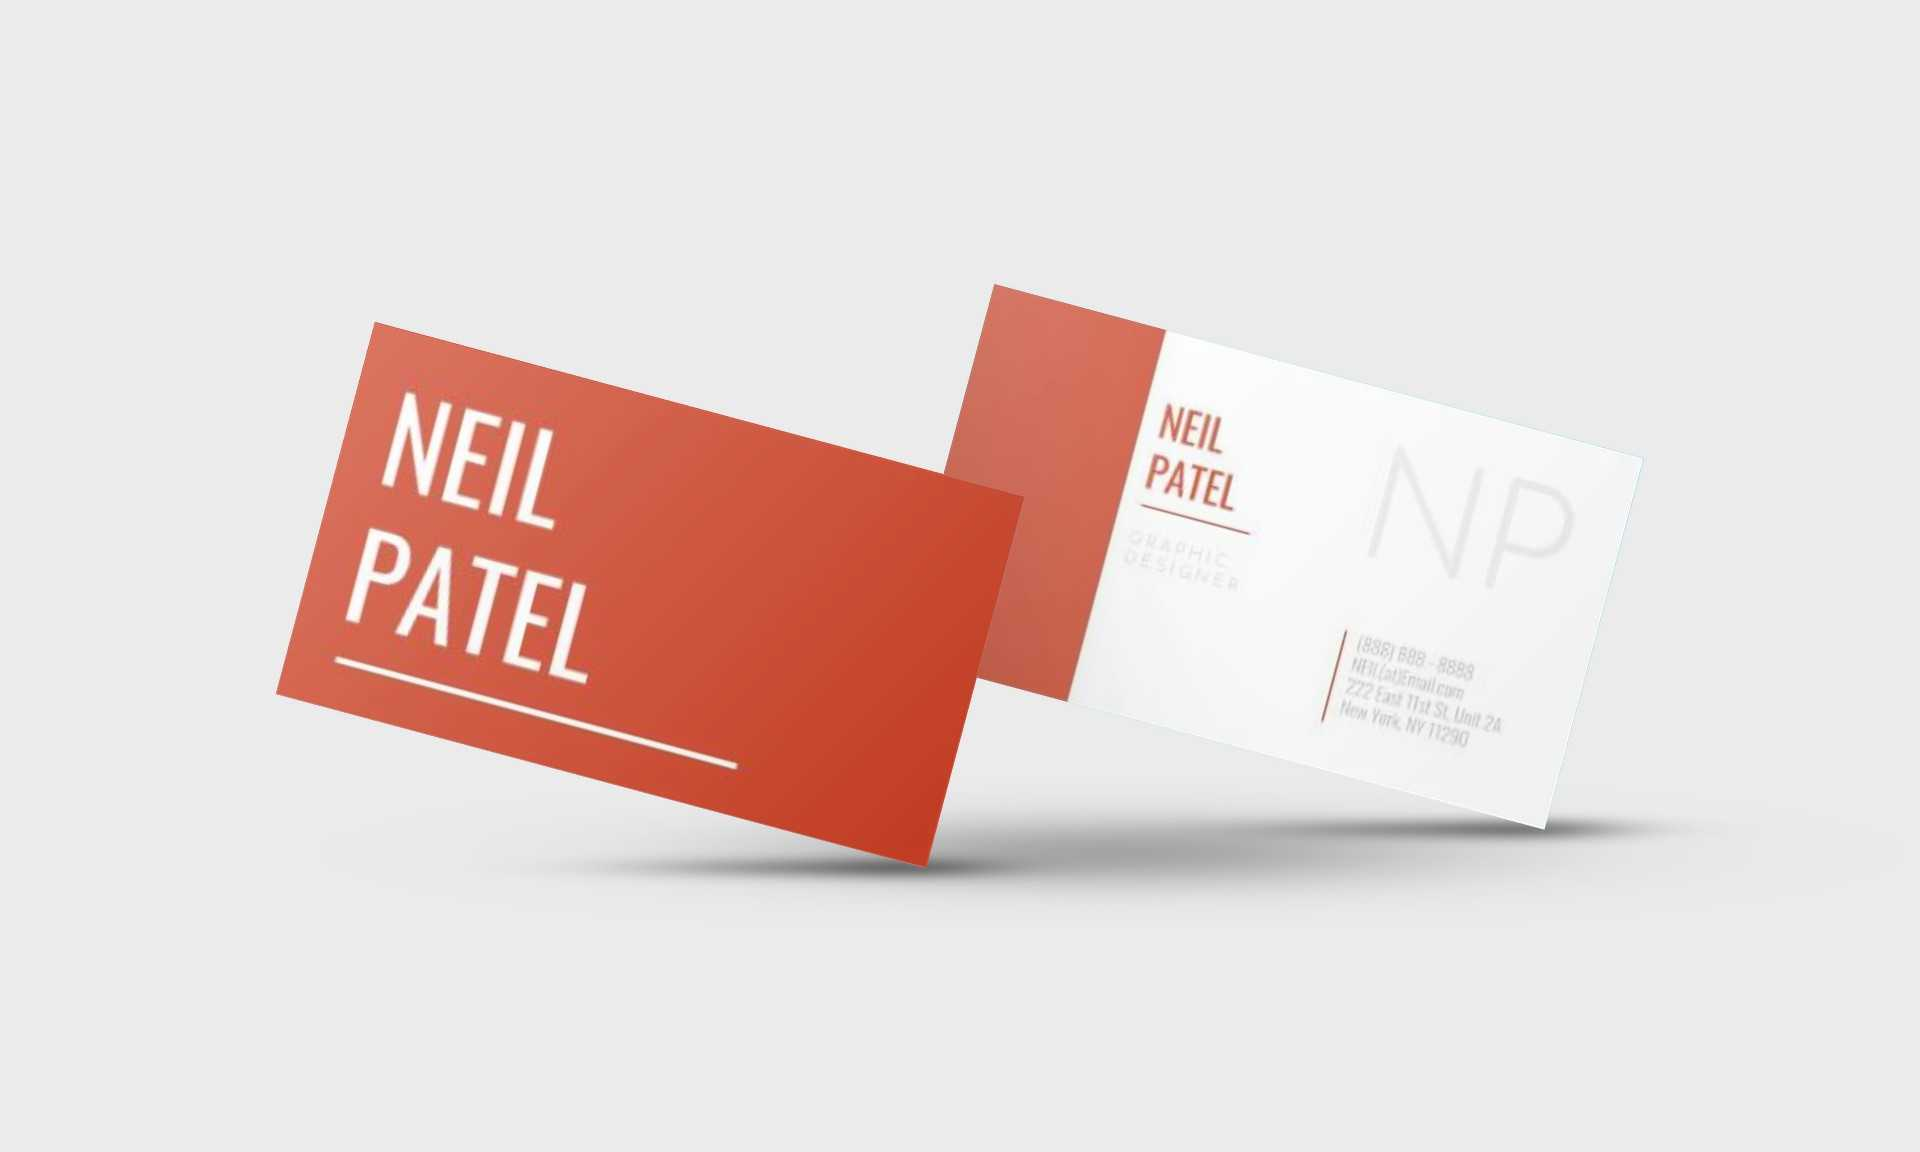 Neil Patel Google Docs Business Card Template - Stand Out Shop With Google Docs Business Card Template